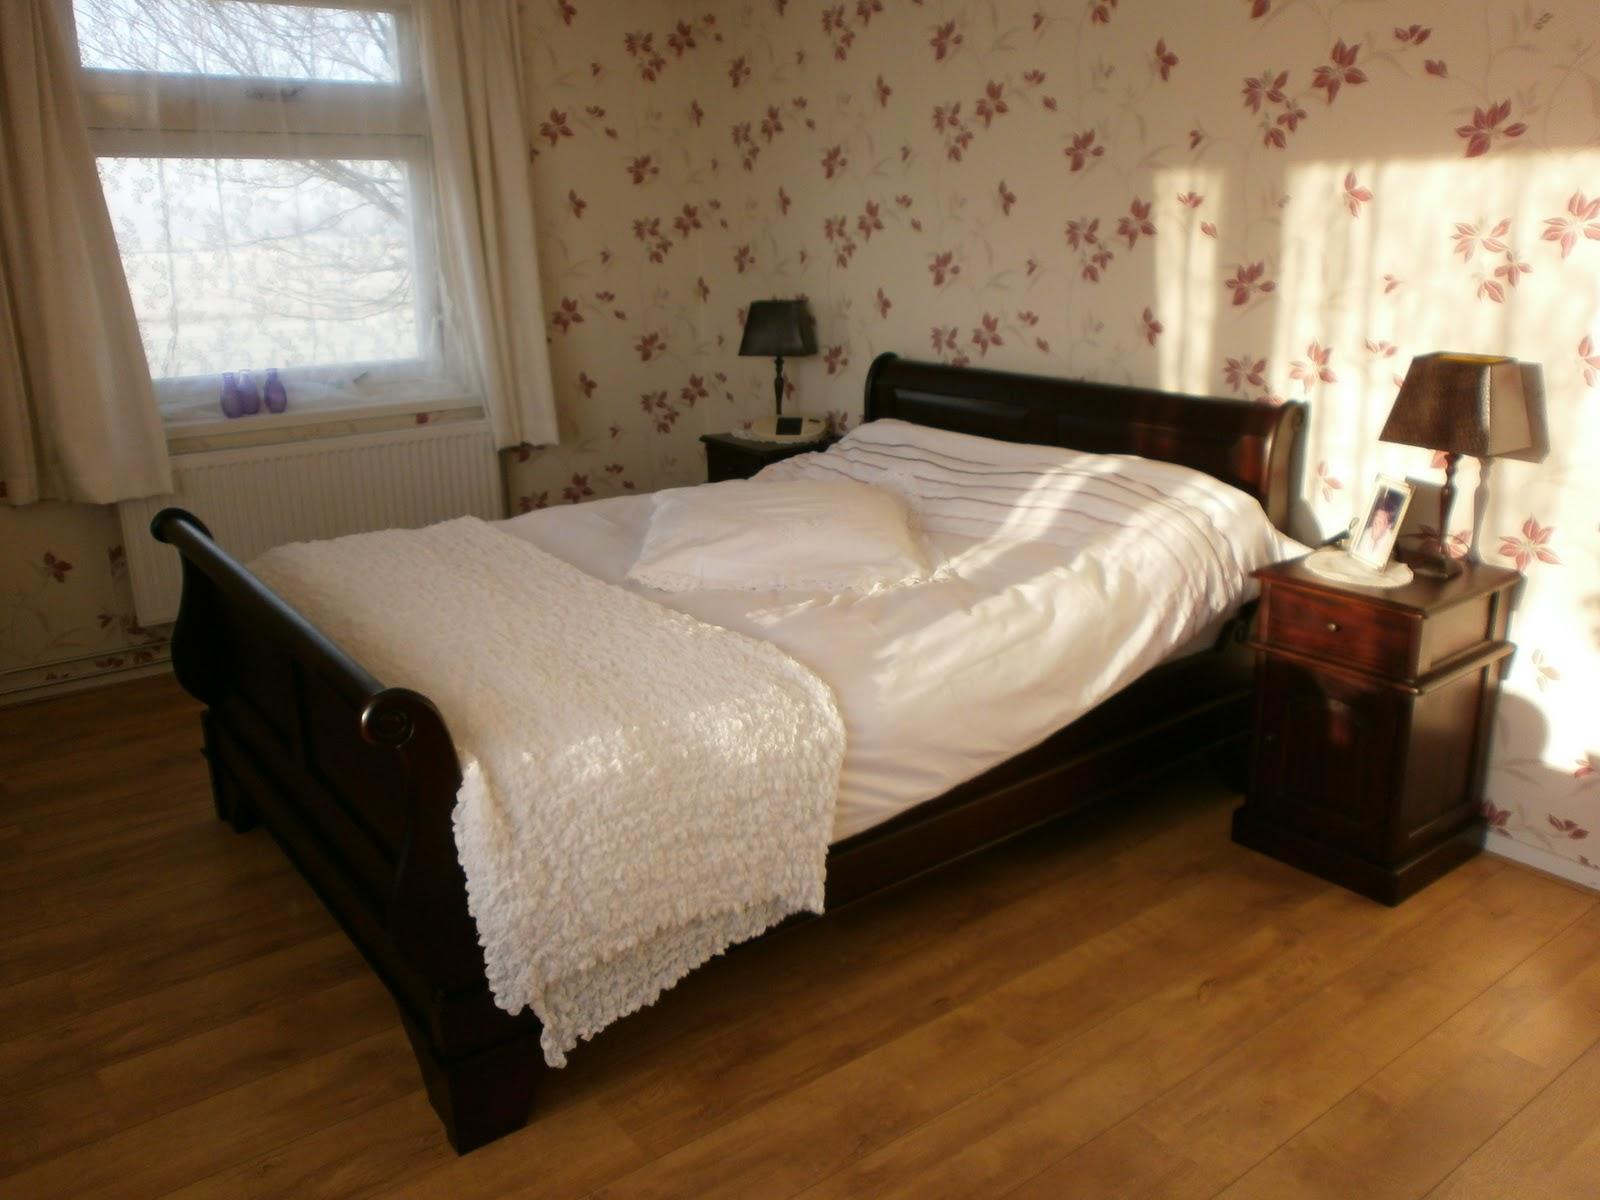 hobbyancker. : slaapkamer nu klaar!